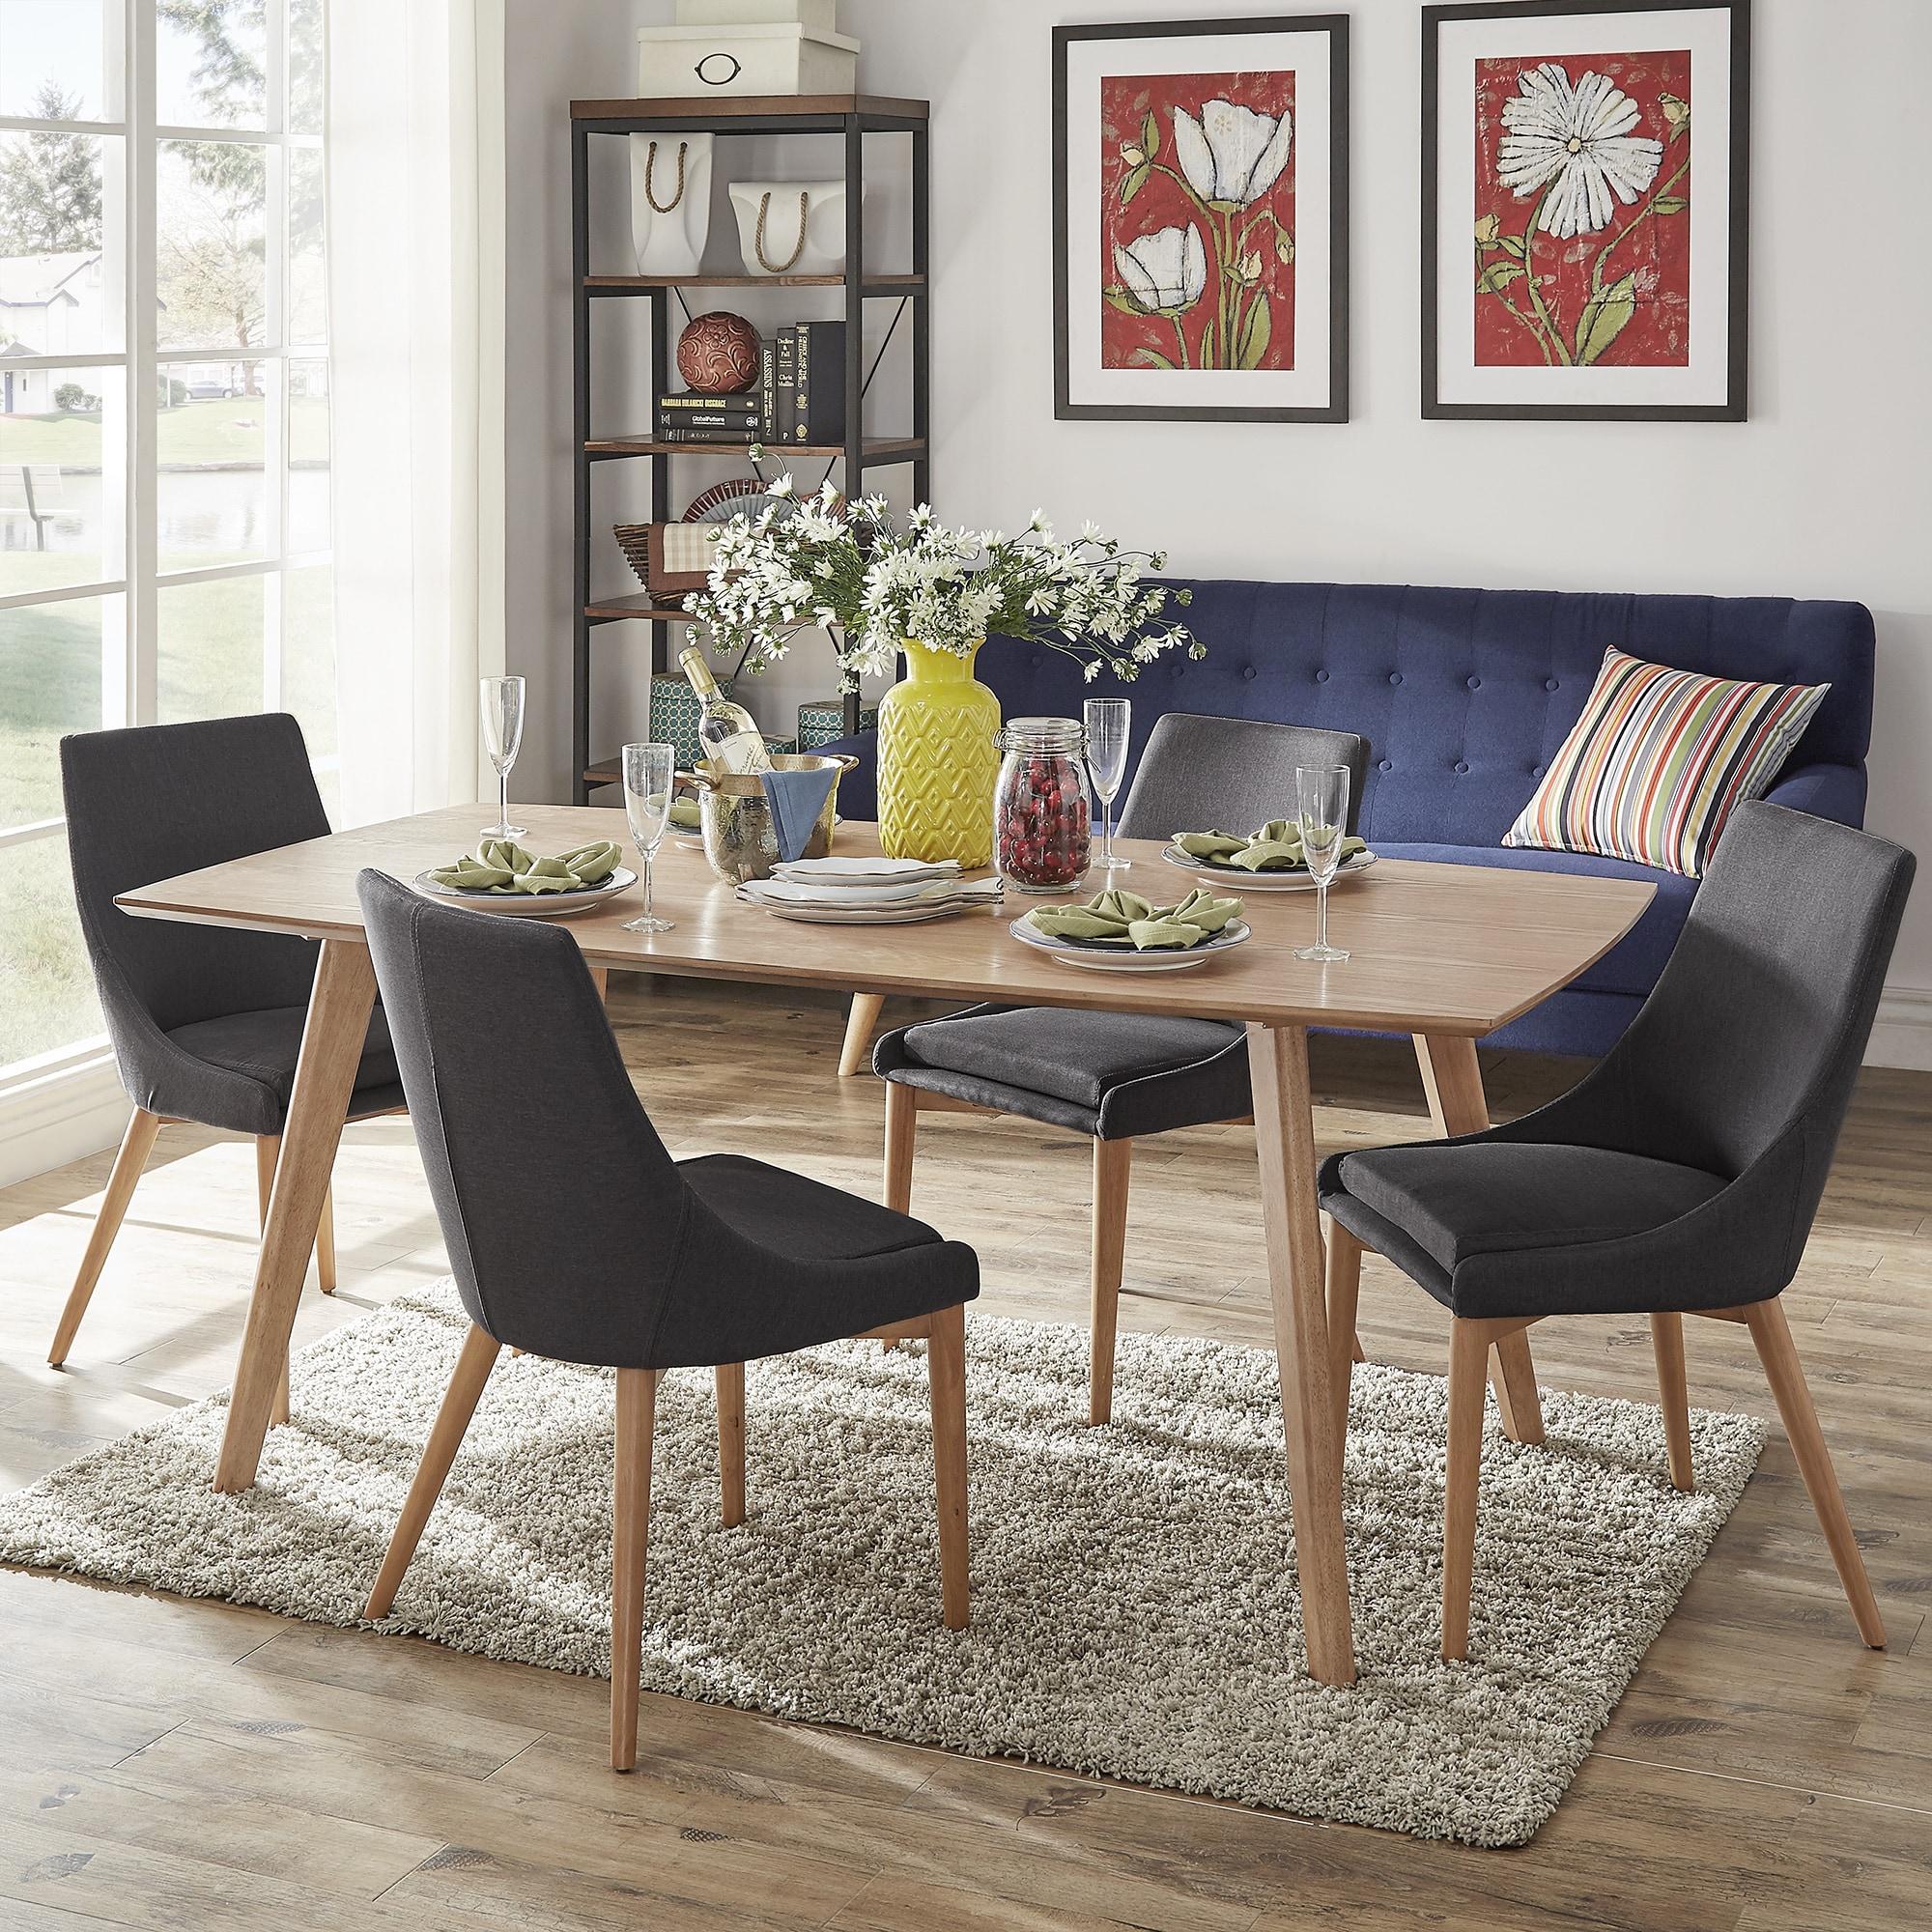 Abelone Scandinavian Dining Table